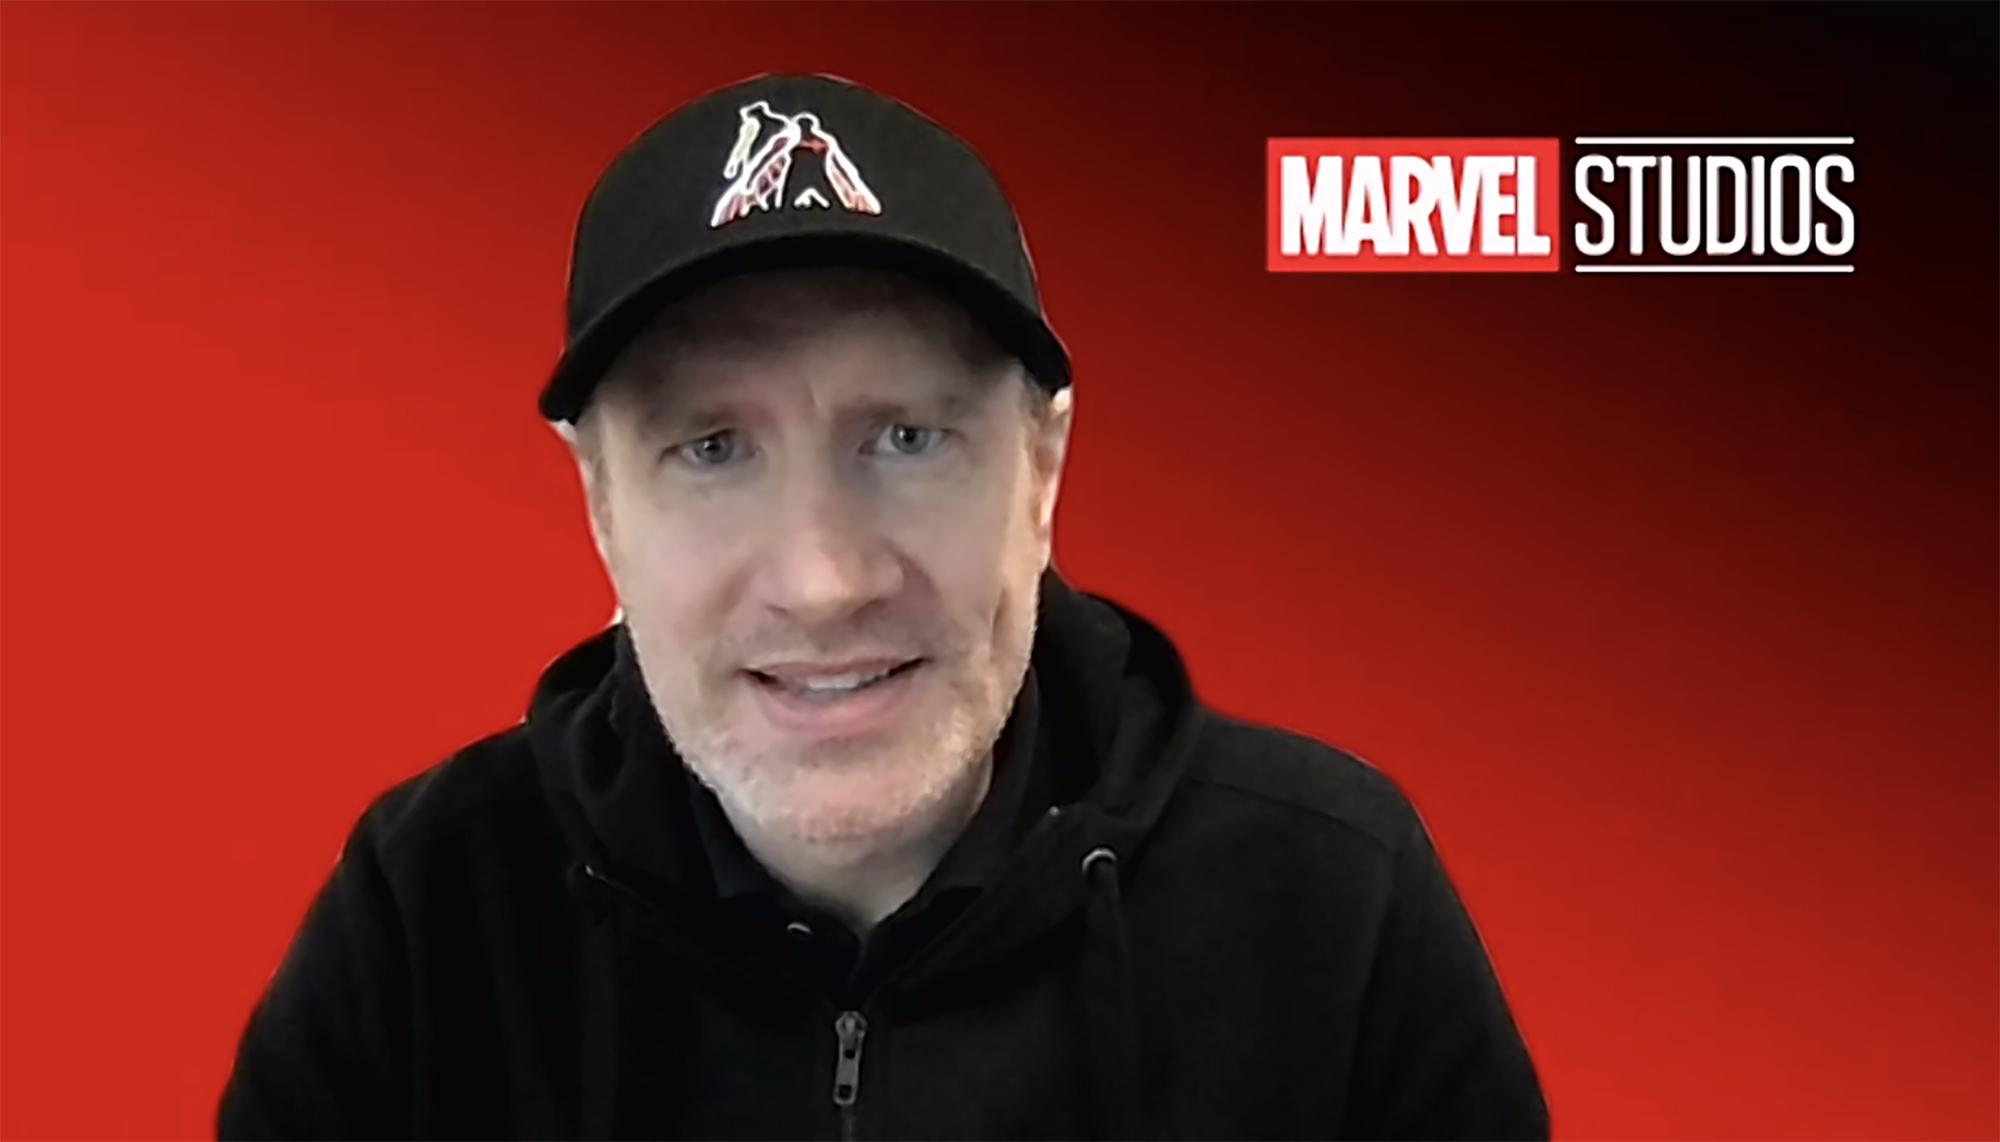 Marvel boss Kevin Feige at Disney's winter investor meeting.